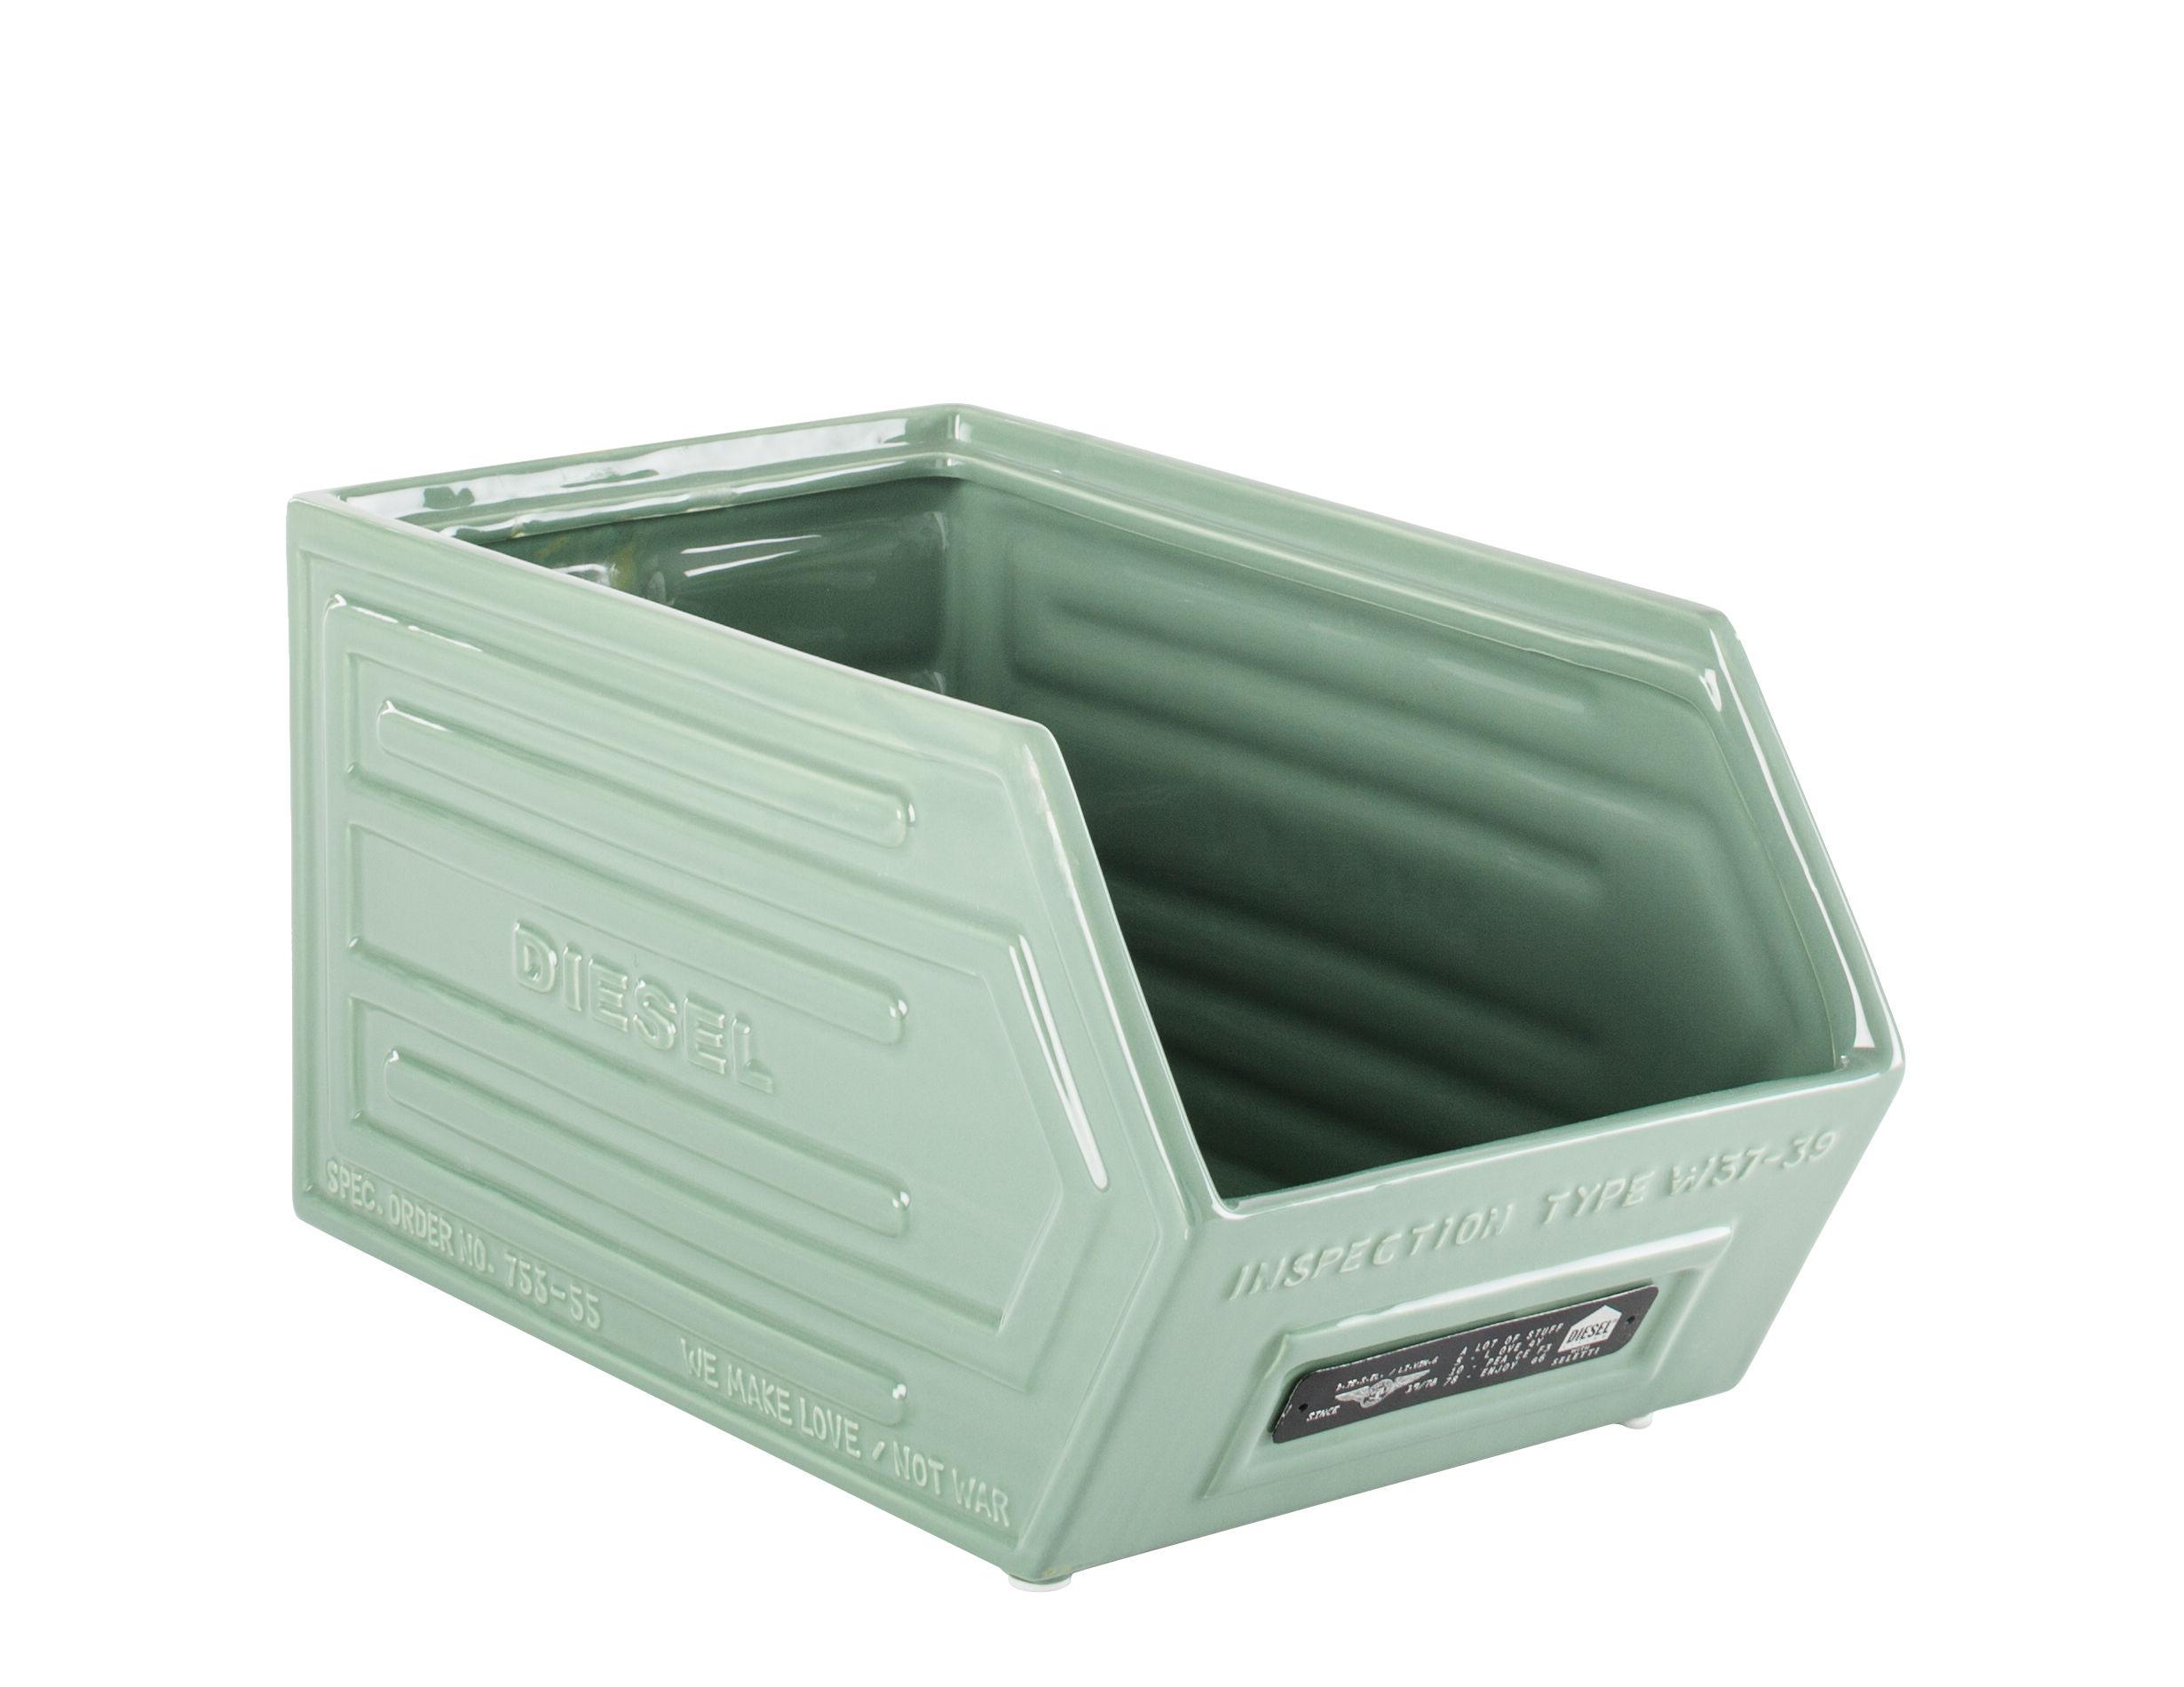 Crate Ablagefach Keramik L 33 Cm X H 17 Cm Grun By Diesel